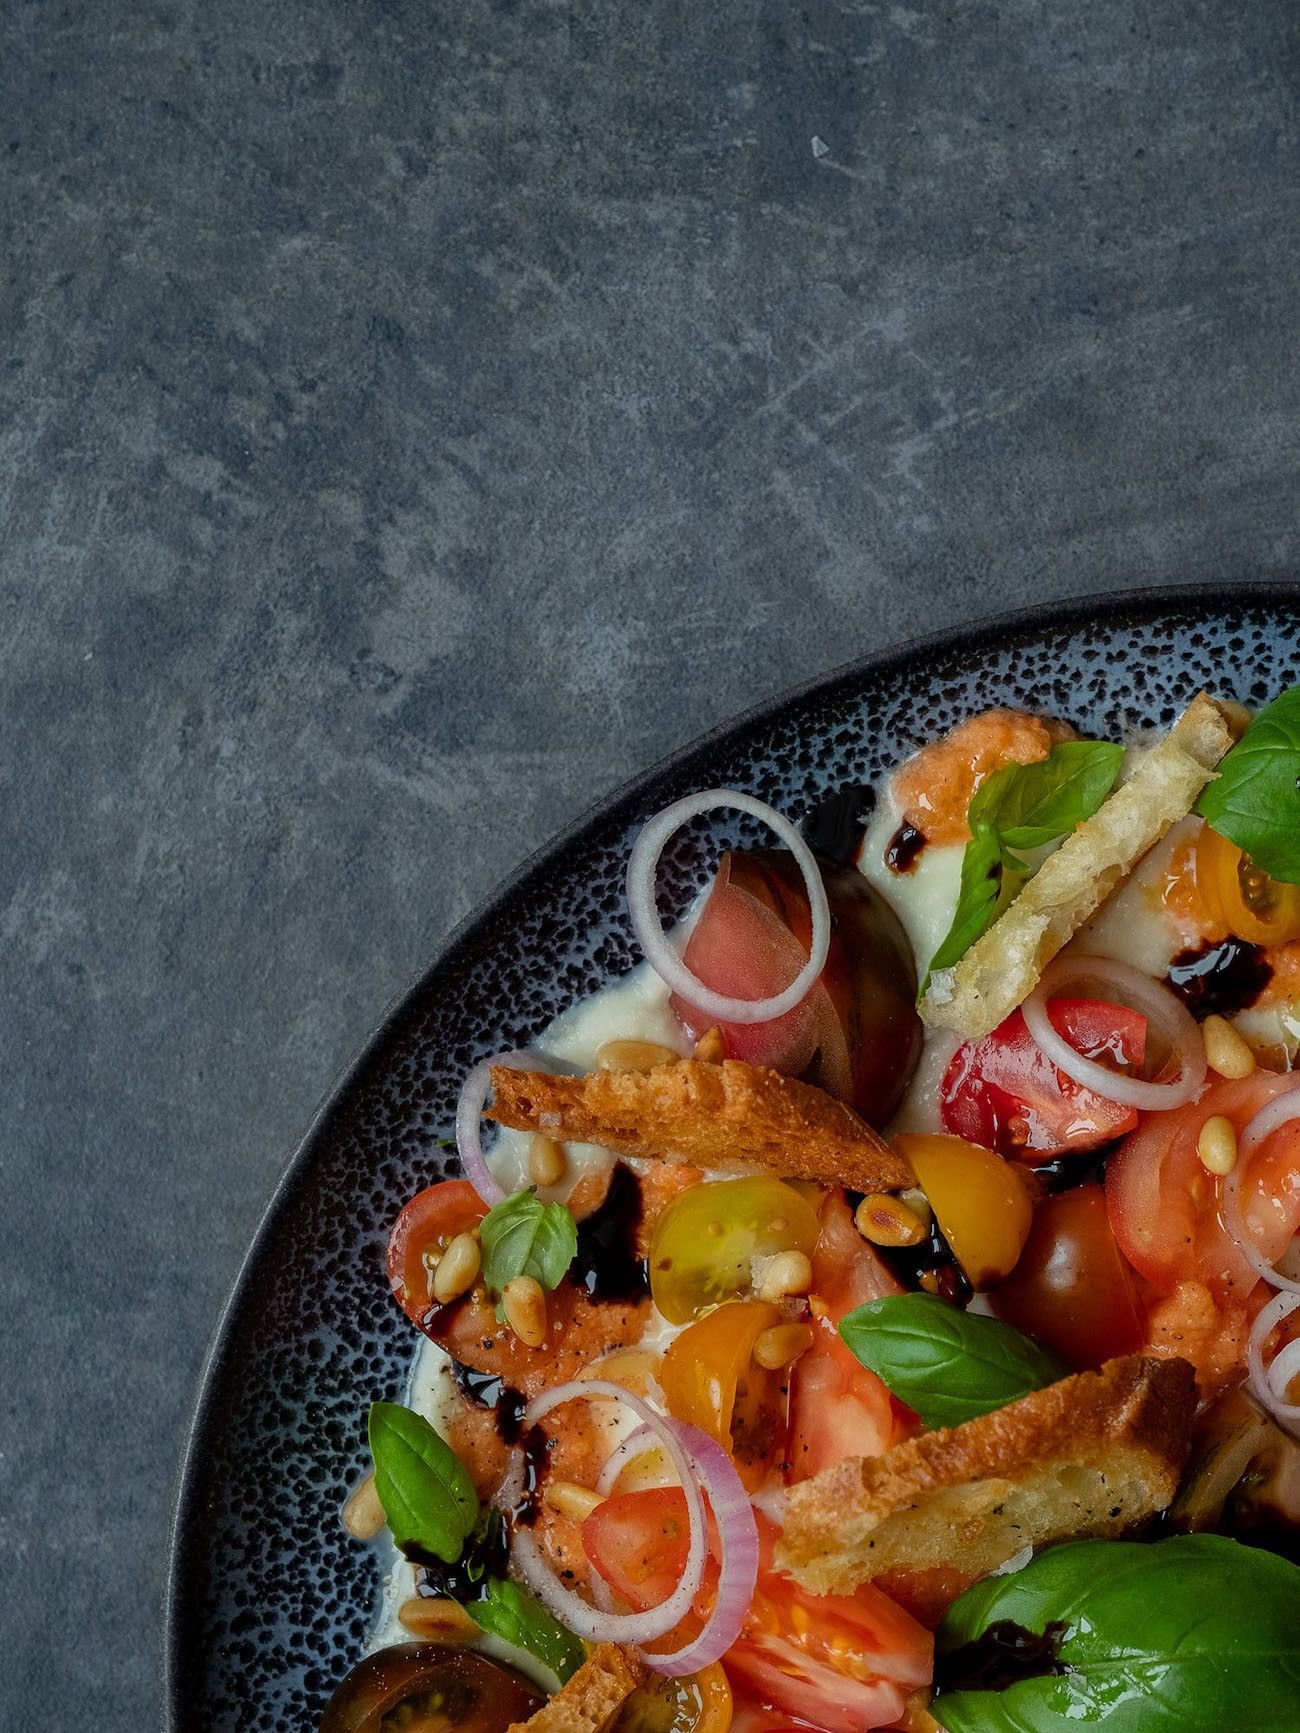 Foodblog, About Fuel, Rezept, Caprese Salat, Rote Zwiebeln, Balsamico, Pinienkerne